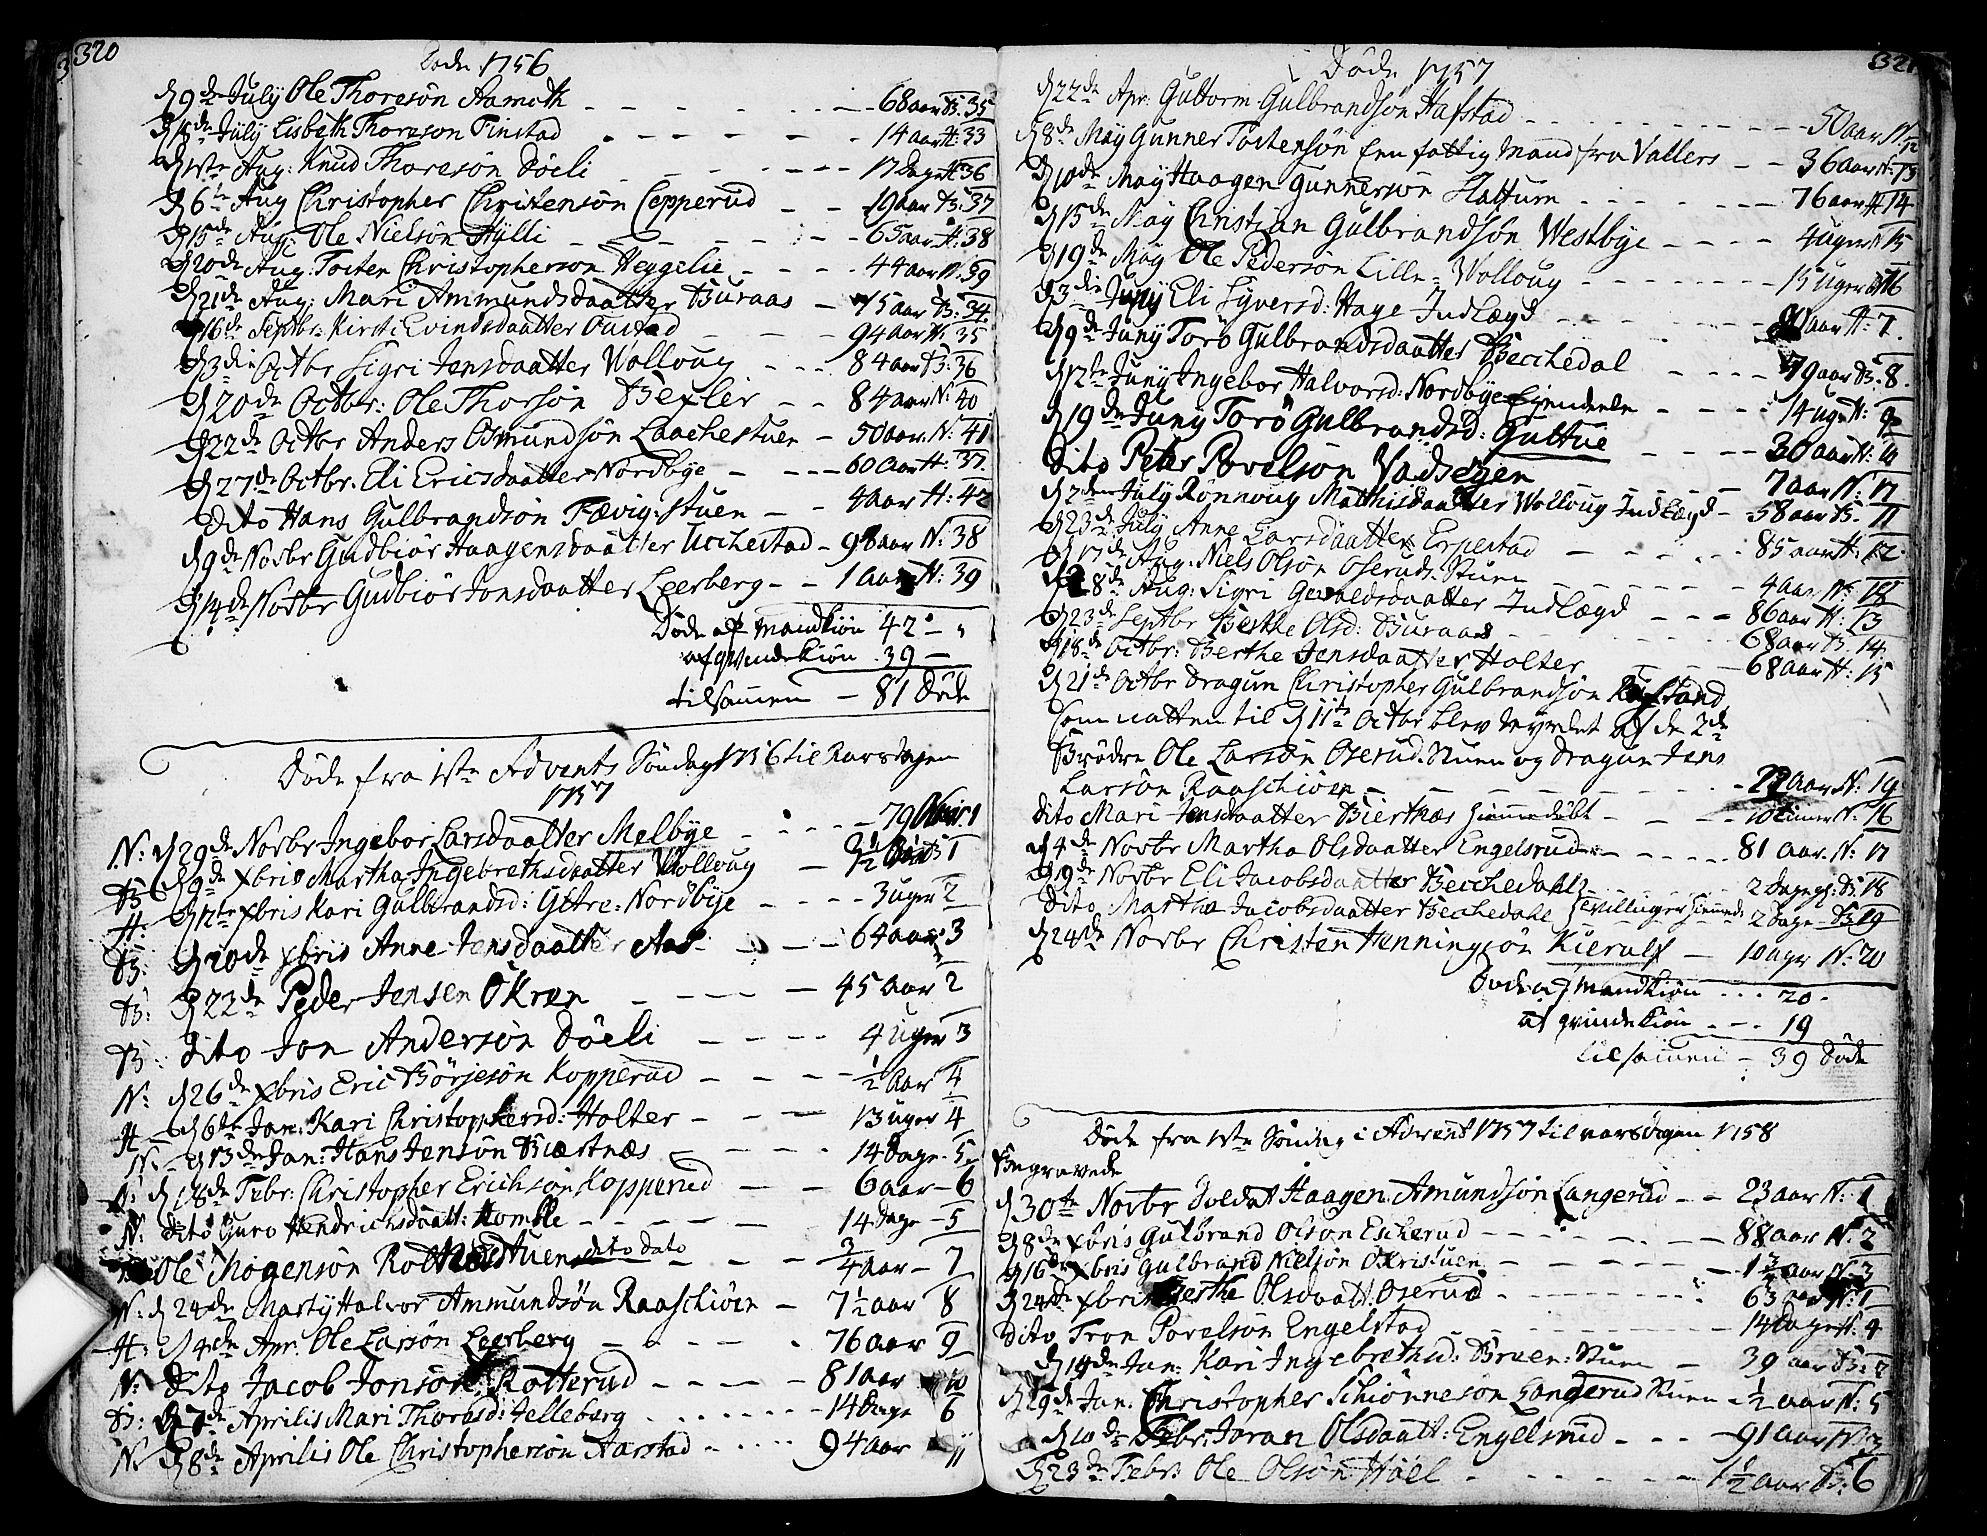 SAO, Nannestad prestekontor Kirkebøker, F/Fa/L0007: Ministerialbok nr. I 7, 1754-1791, s. 320-321